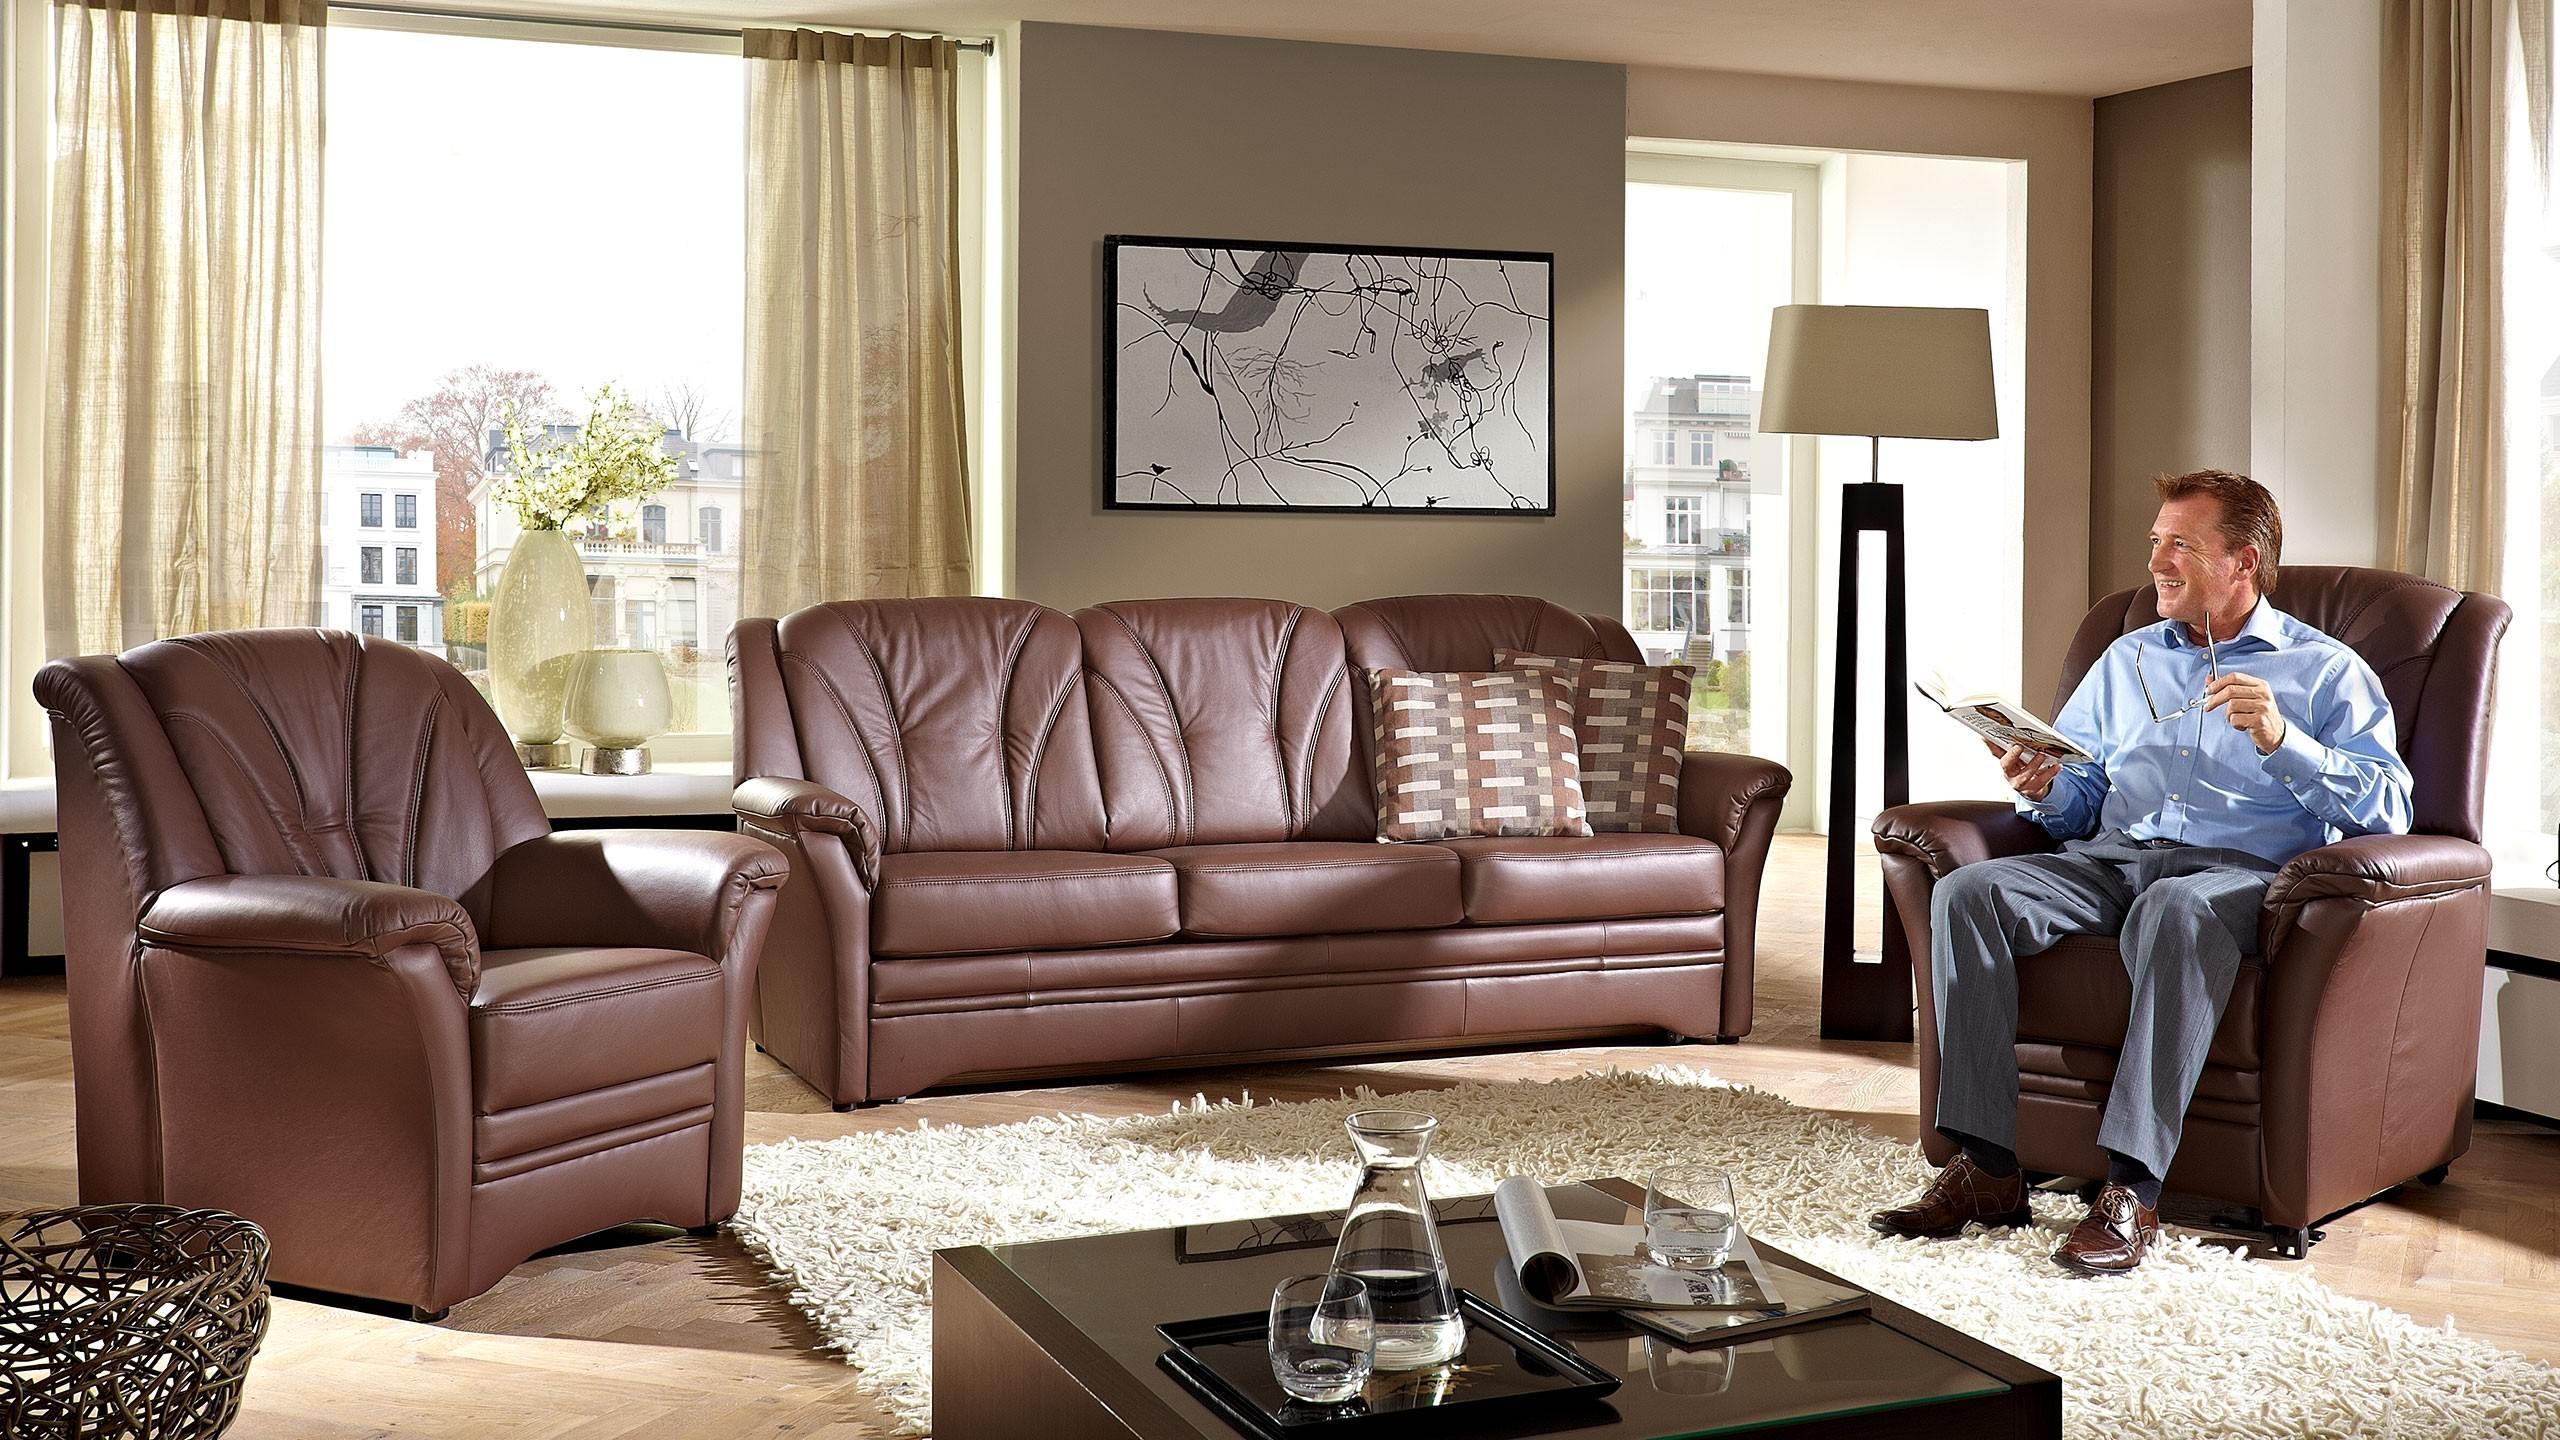 Full Size of Sofa Leder Braun Otto 3 2 1 Set Couch Gebraucht Vintage Ikea 2 Sitzer   Chesterfield Rustikal Ledersofa Design Kaufen 3 Sitzer Berlin Multipolster Dreisitzer Sofa Sofa Leder Braun